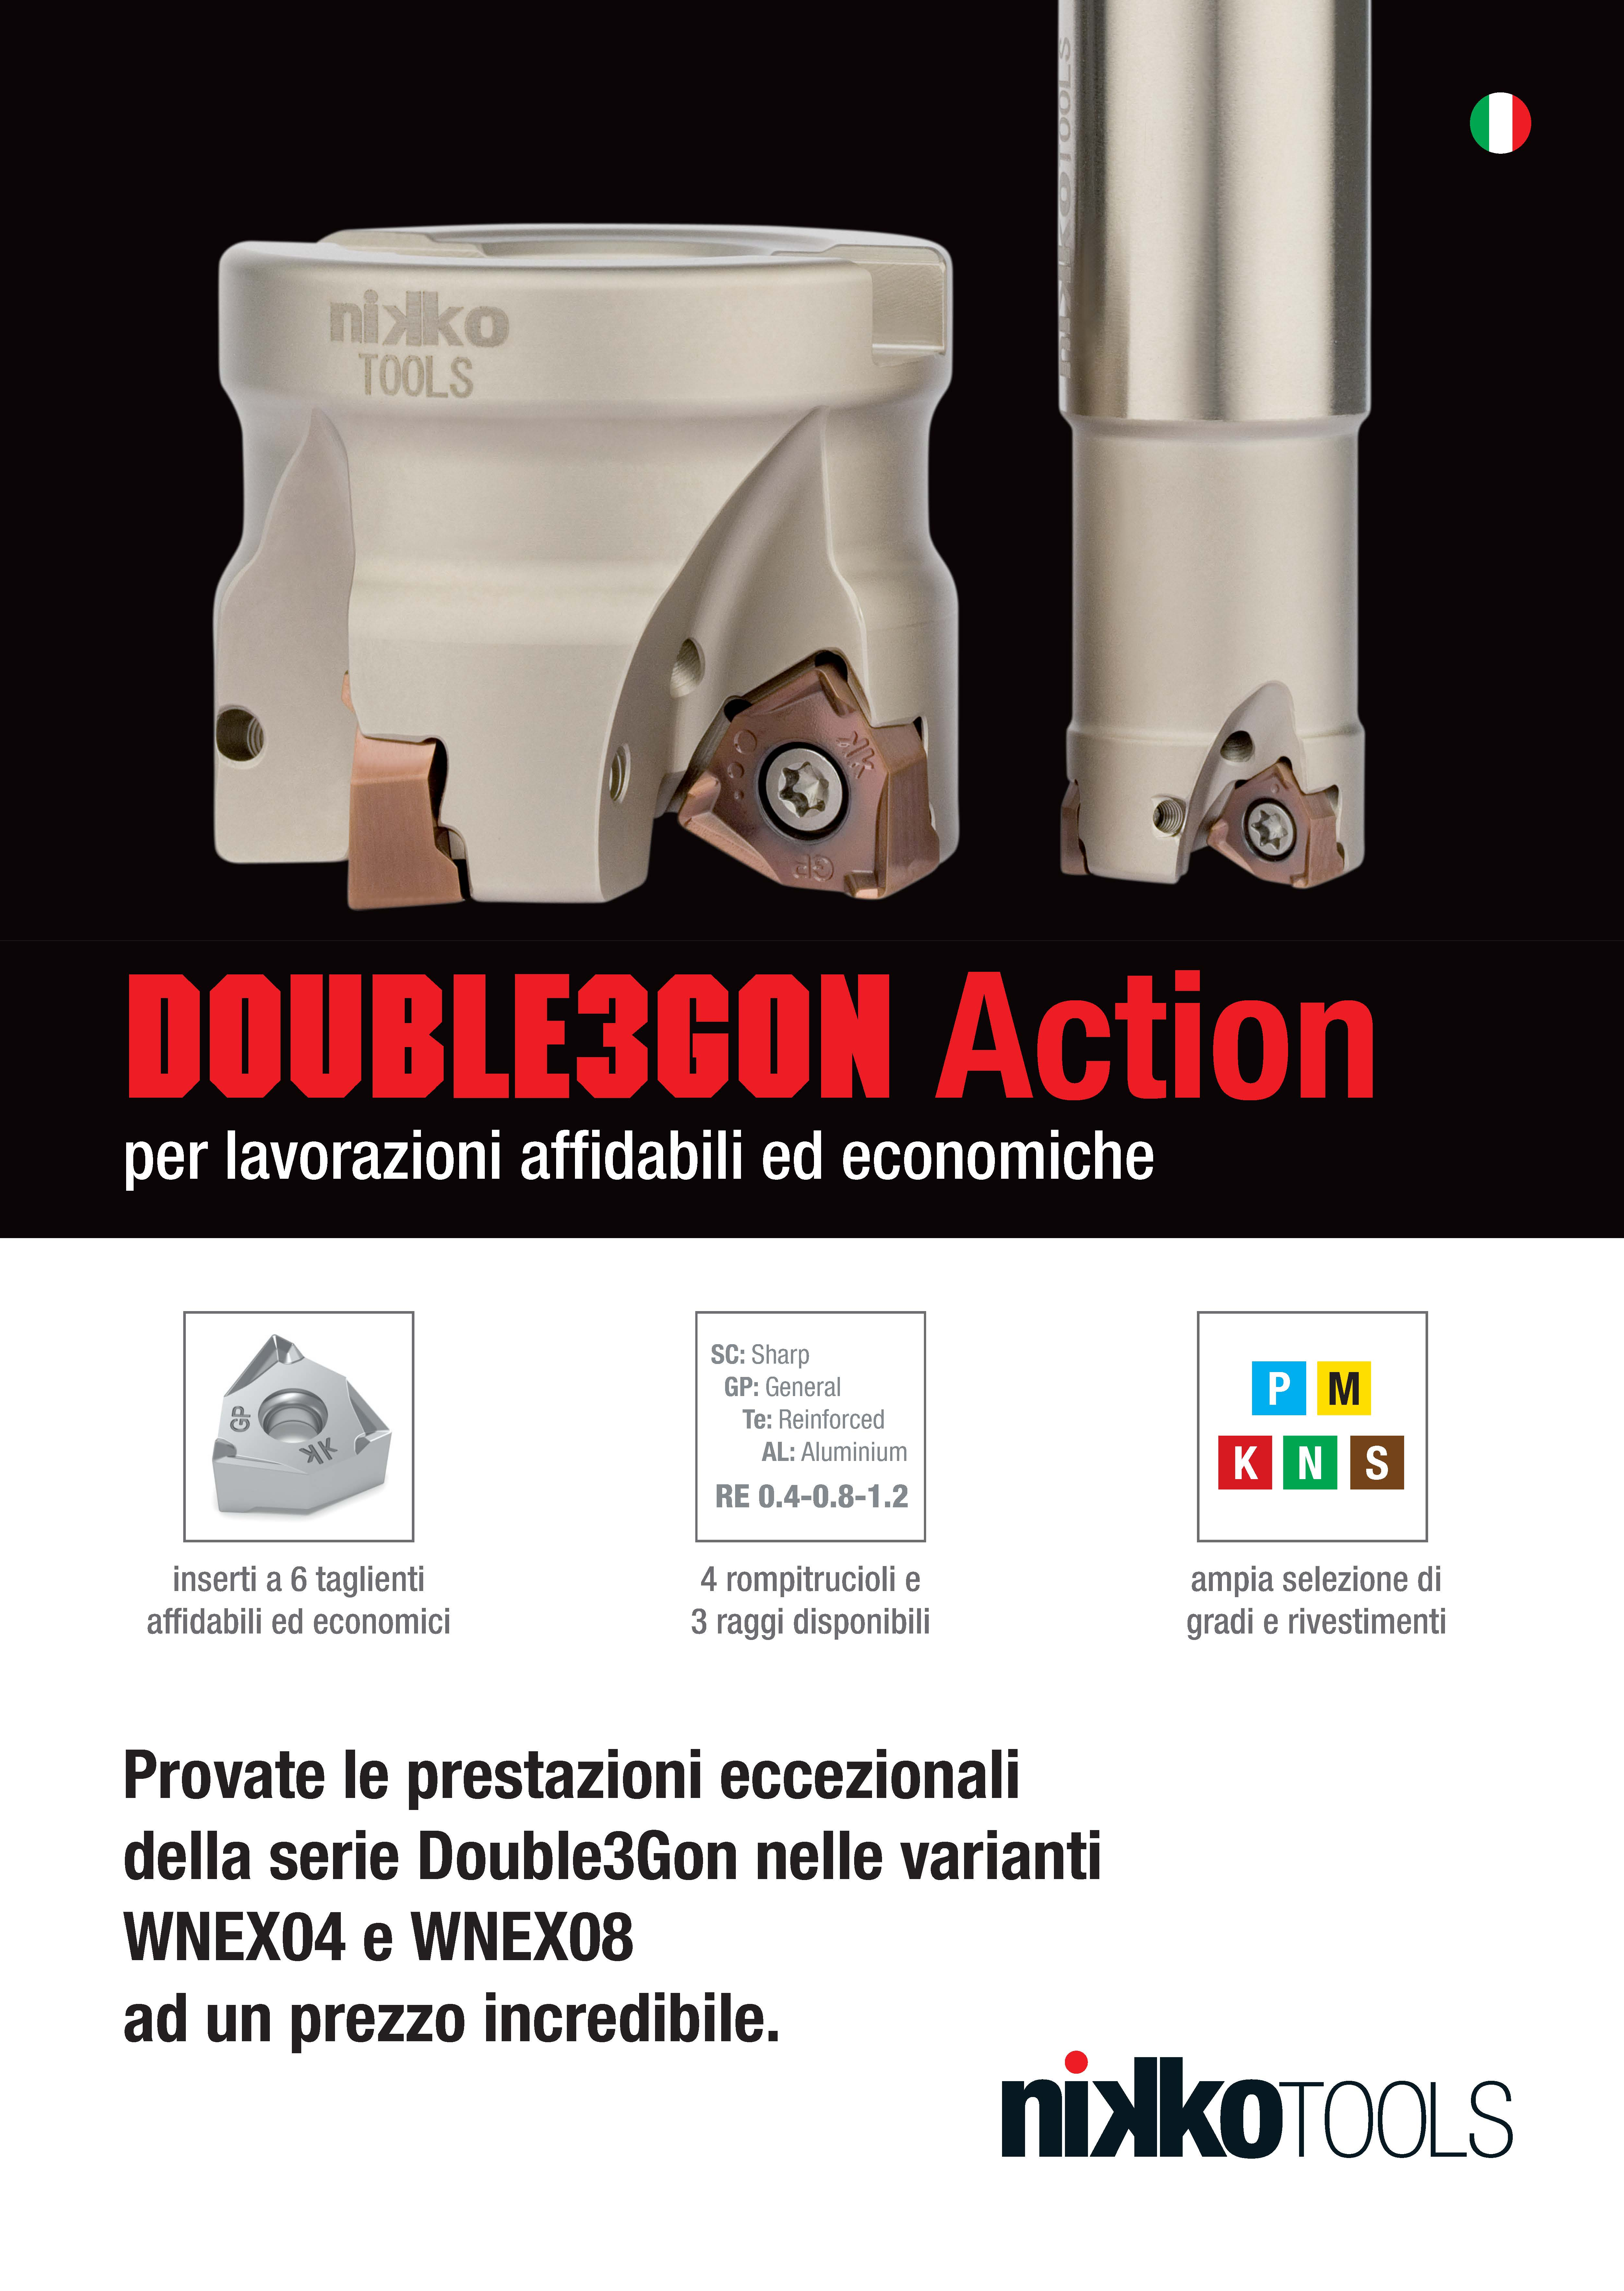 Nikko Tools Double3Gon Action 2020